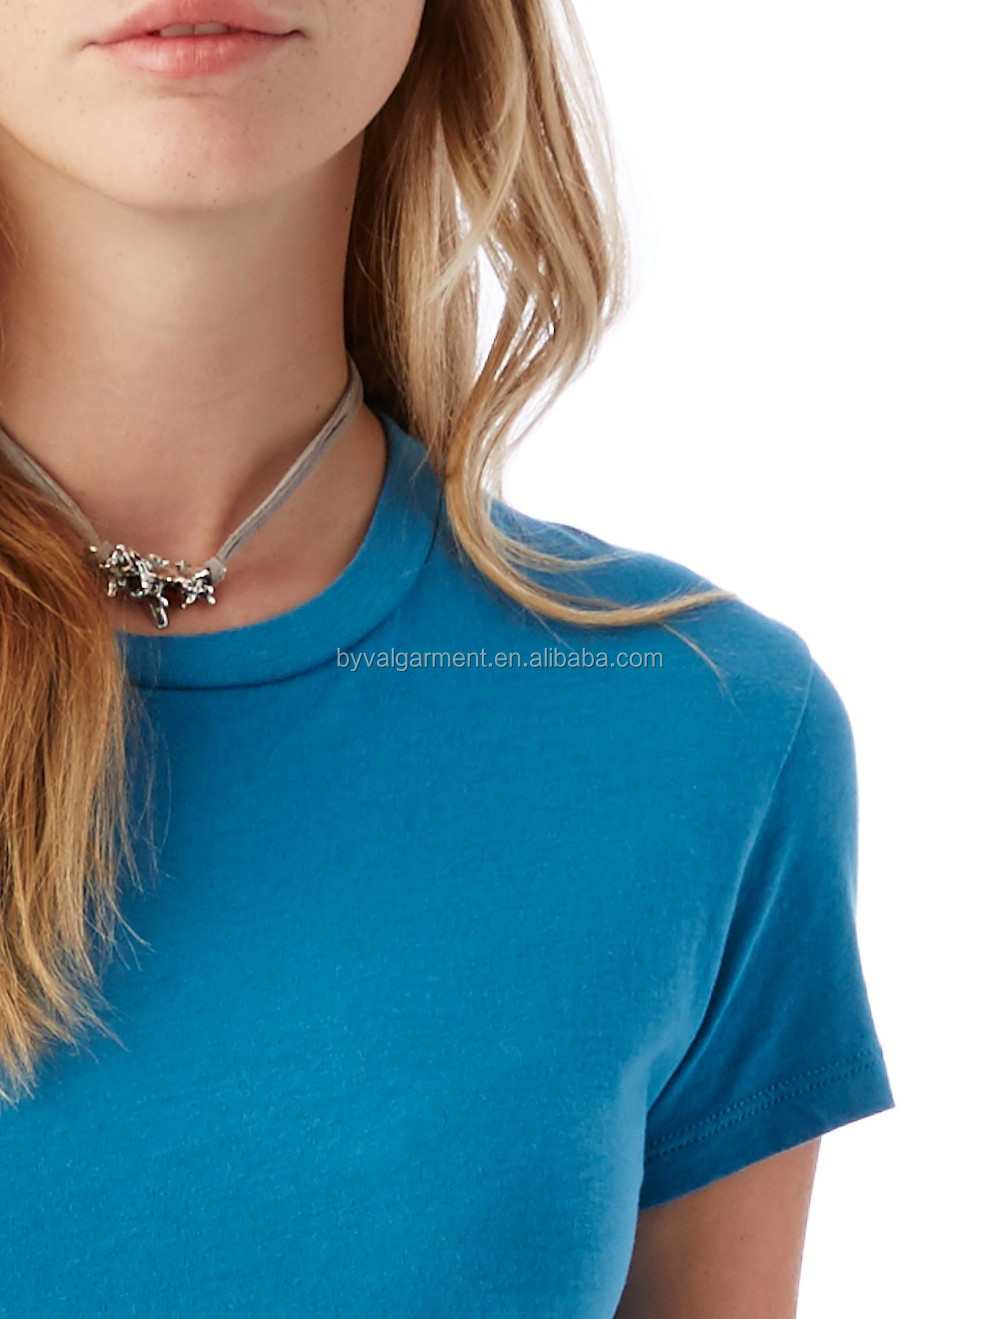 100% organic cotton Bulk plain t-shirts for women (10).jpg